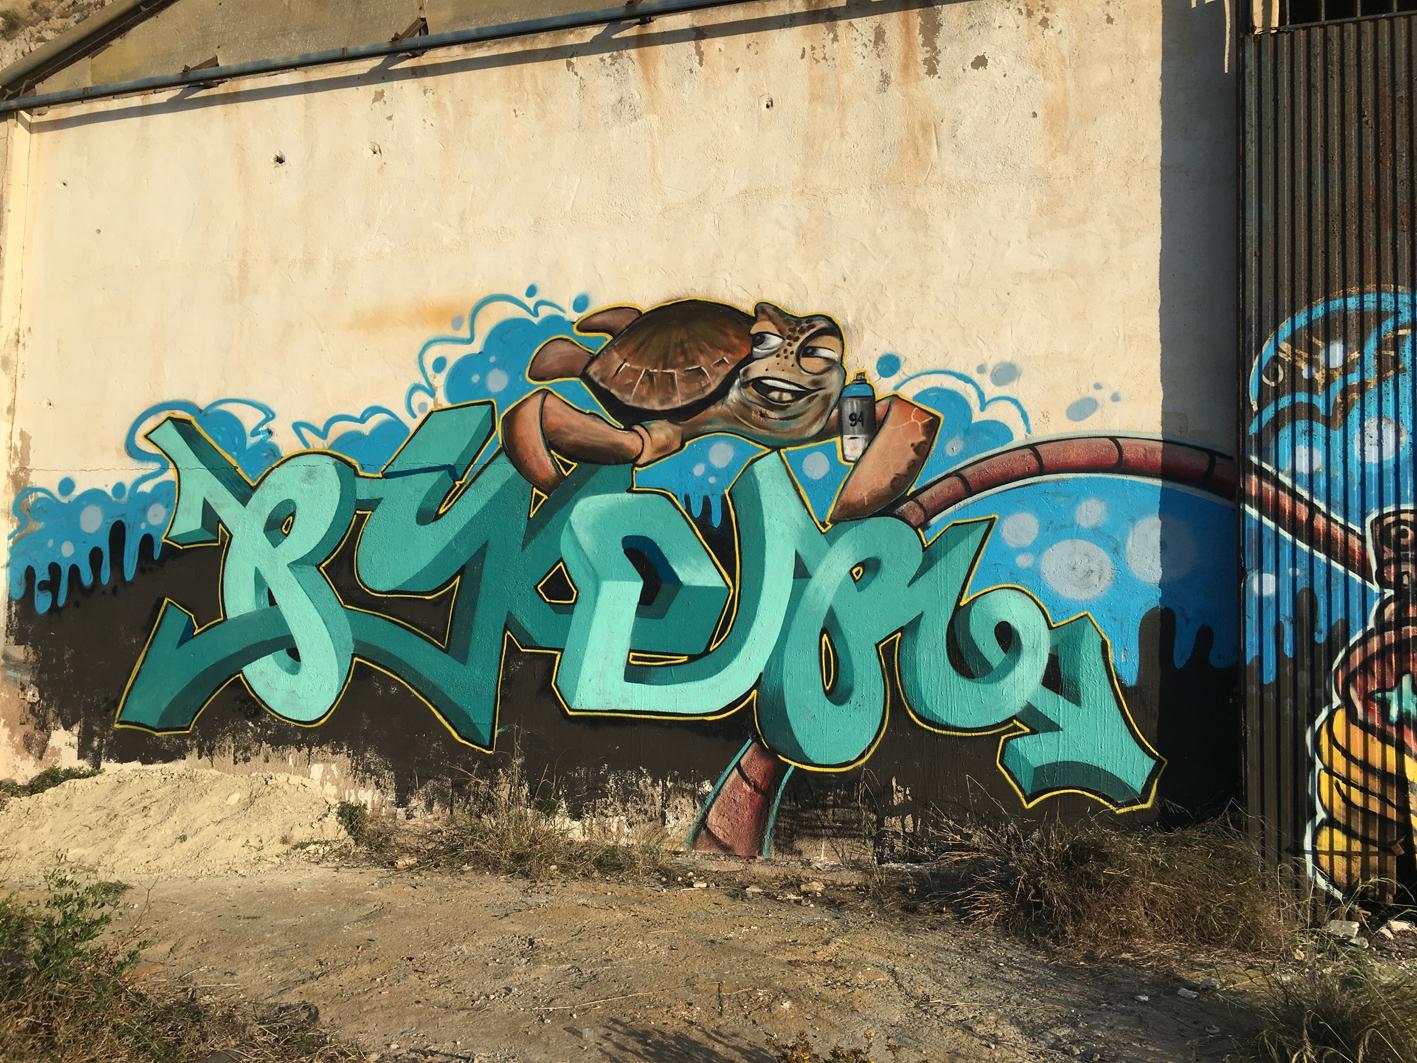 Mural Graffiti económico Piker tortuga marina